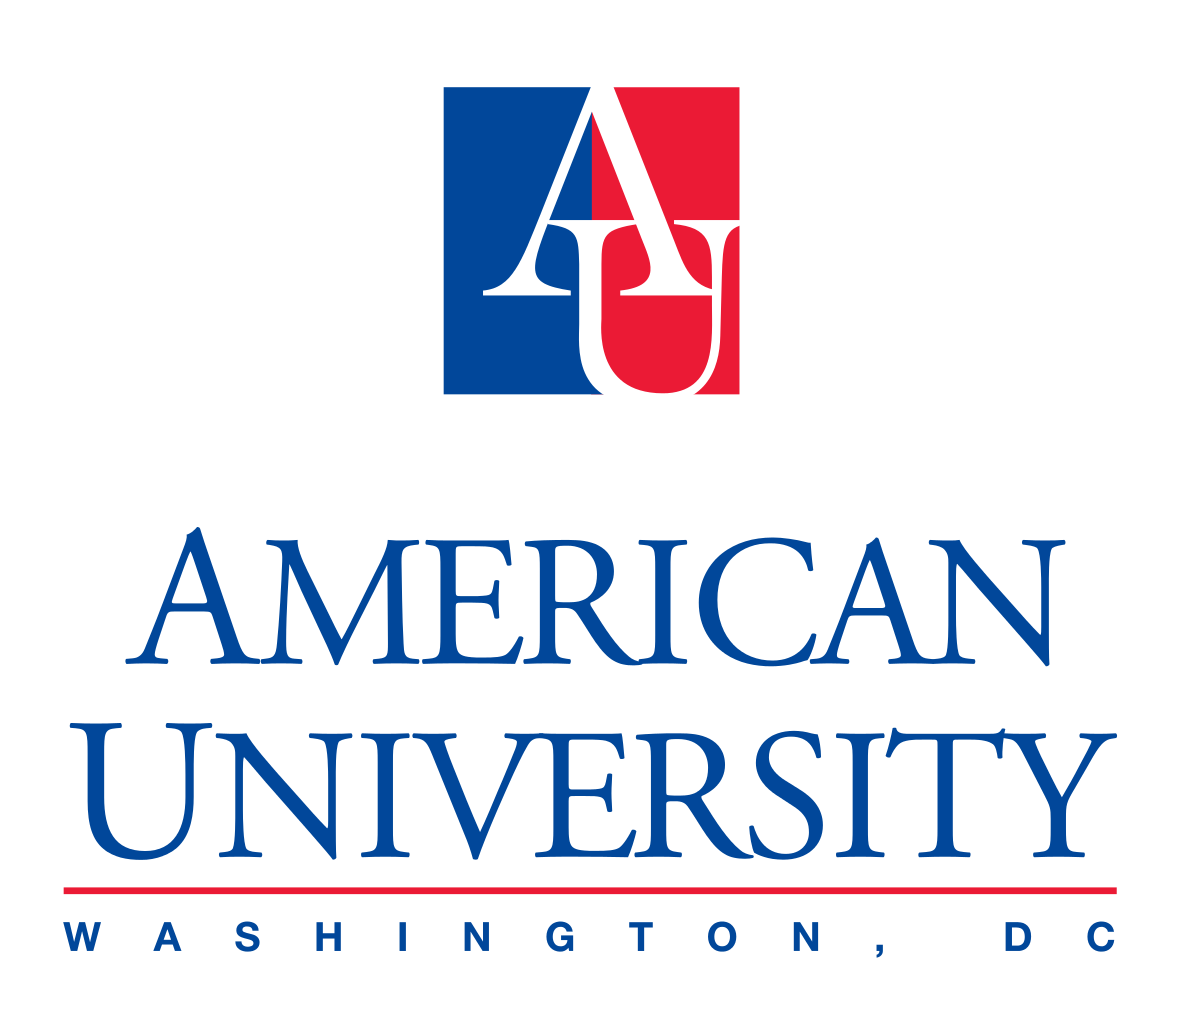 American University Wikipedia The Free Encyclopedia American Universities University Logo Online Education